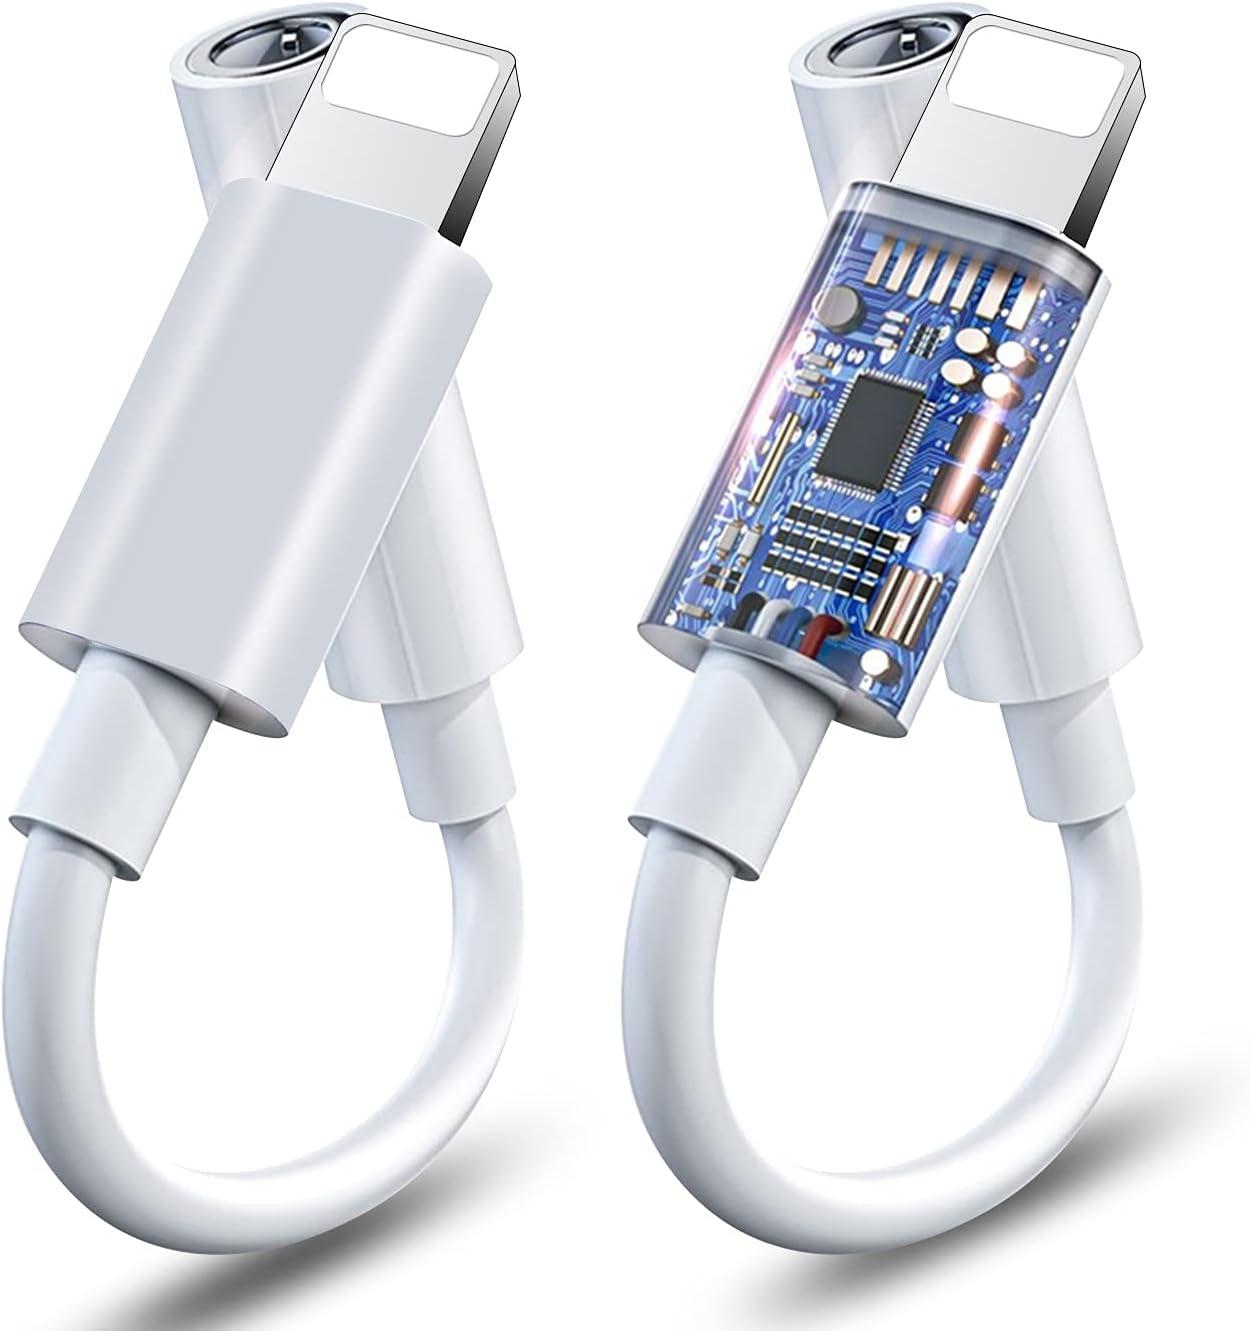 3.5mm Headphones Jack Adapter Award-winning store for 2 Apple Pack Memphis Mall iPhone MF